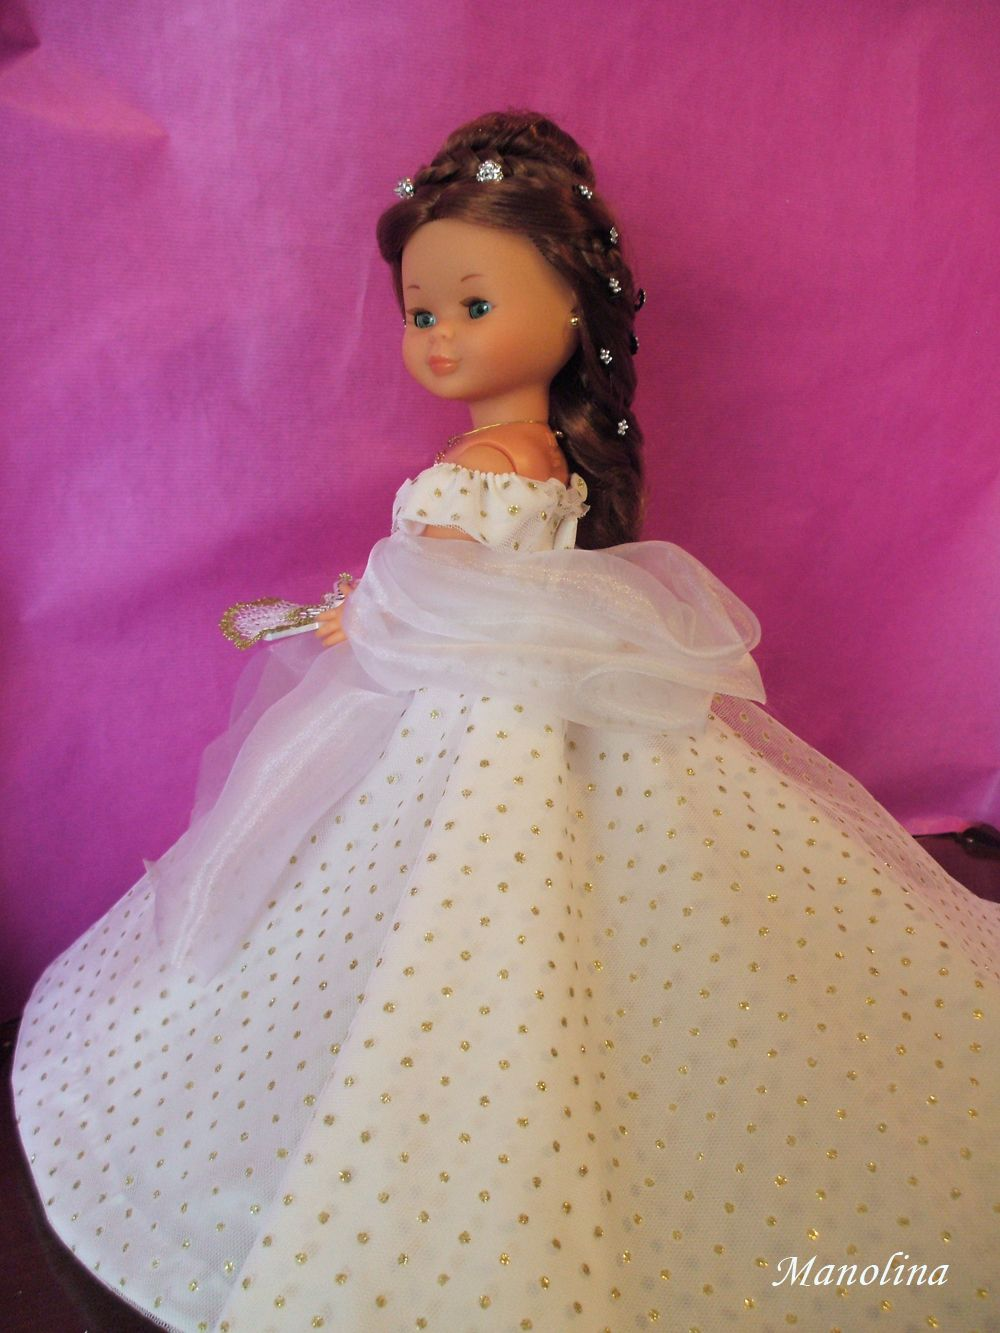 zipp zipp | sissy doll | Pinterest | Buscar novia, Hermosa y Novios